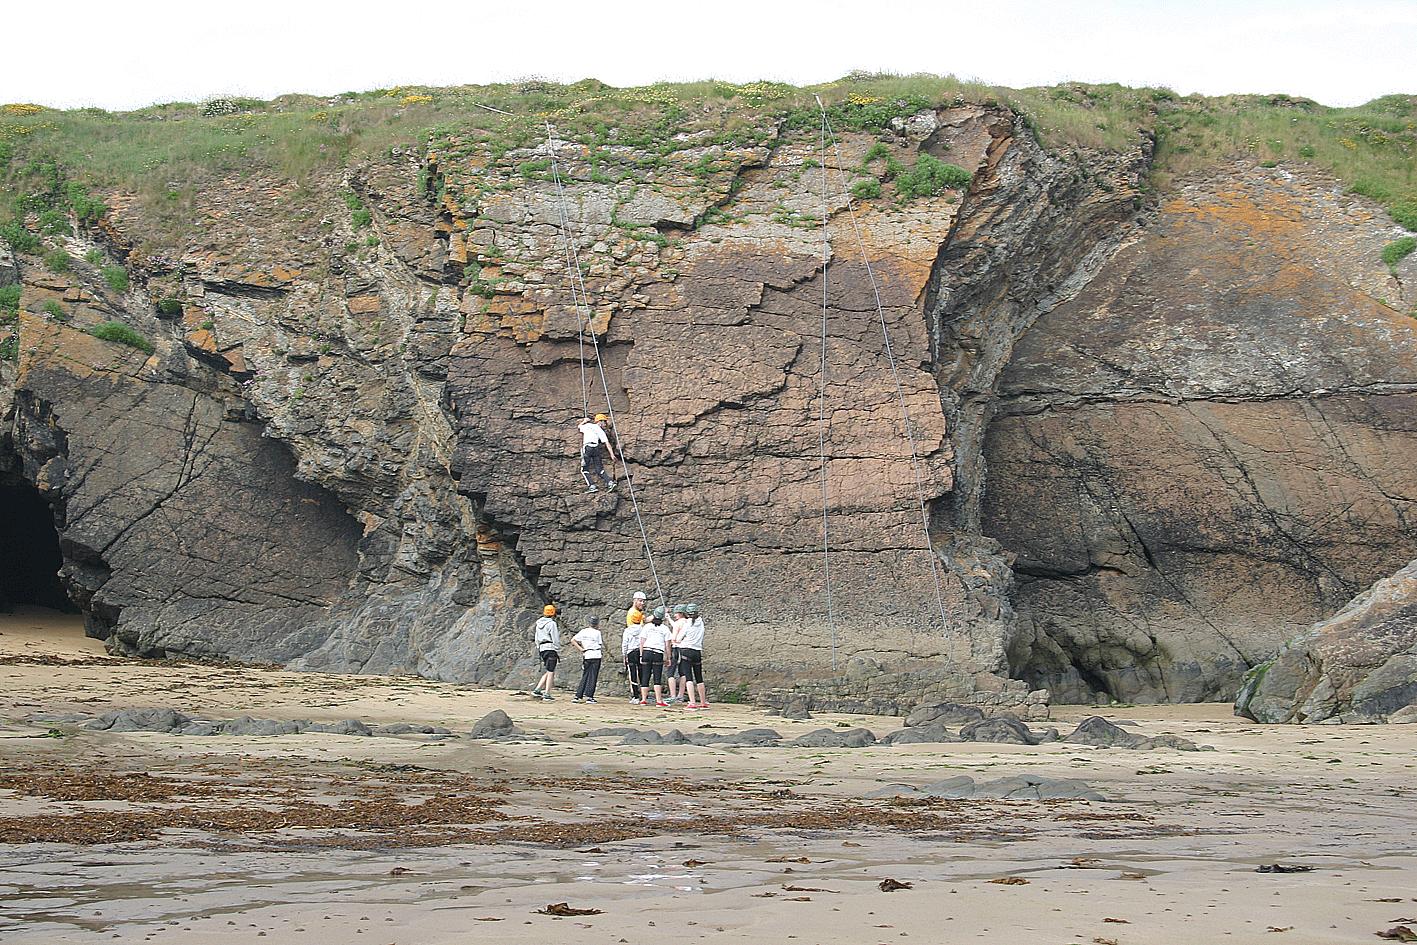 Rock Climbing & Abseiling 2016 Ardmore ireland ecole de mer students